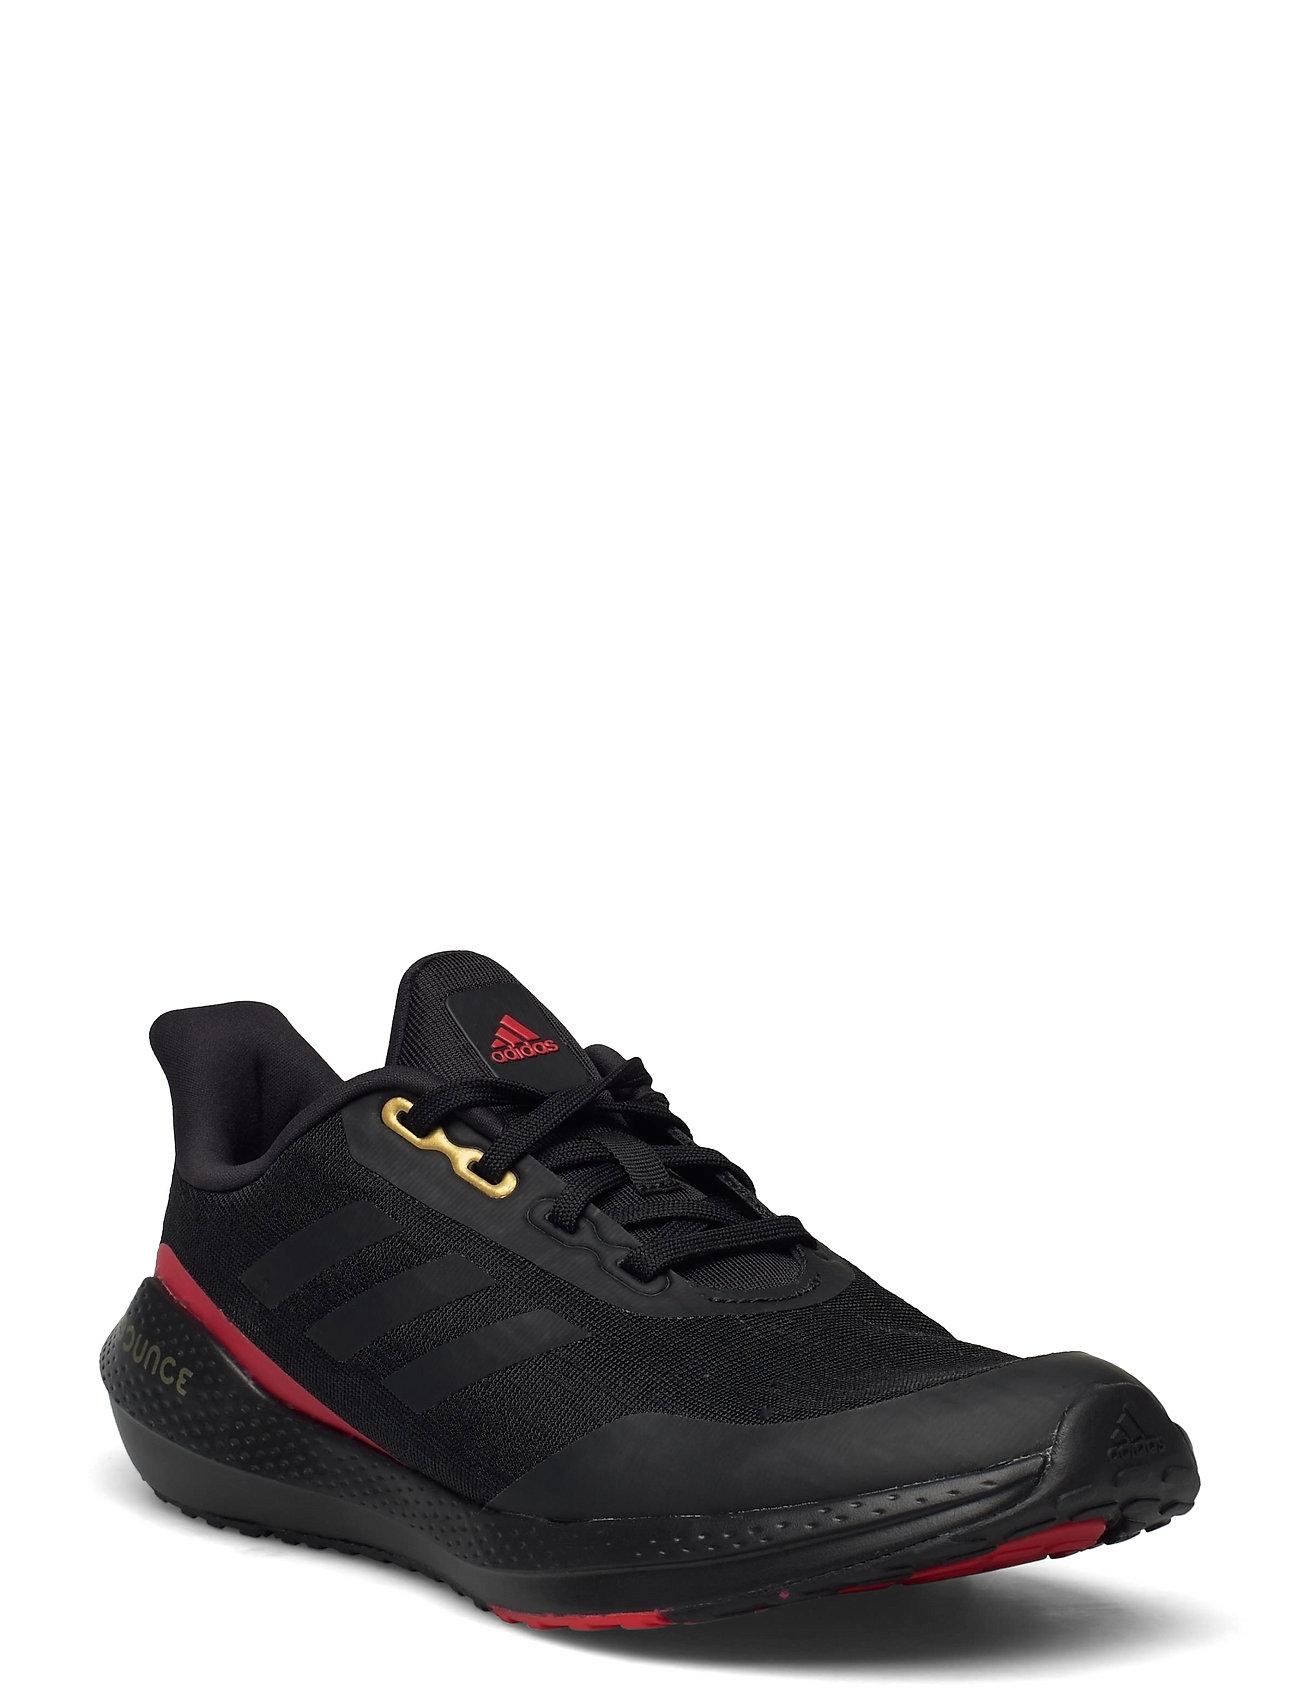 Eq21 Run Shoes Sports Shoes Running/training Shoes Sort Adidas Performance